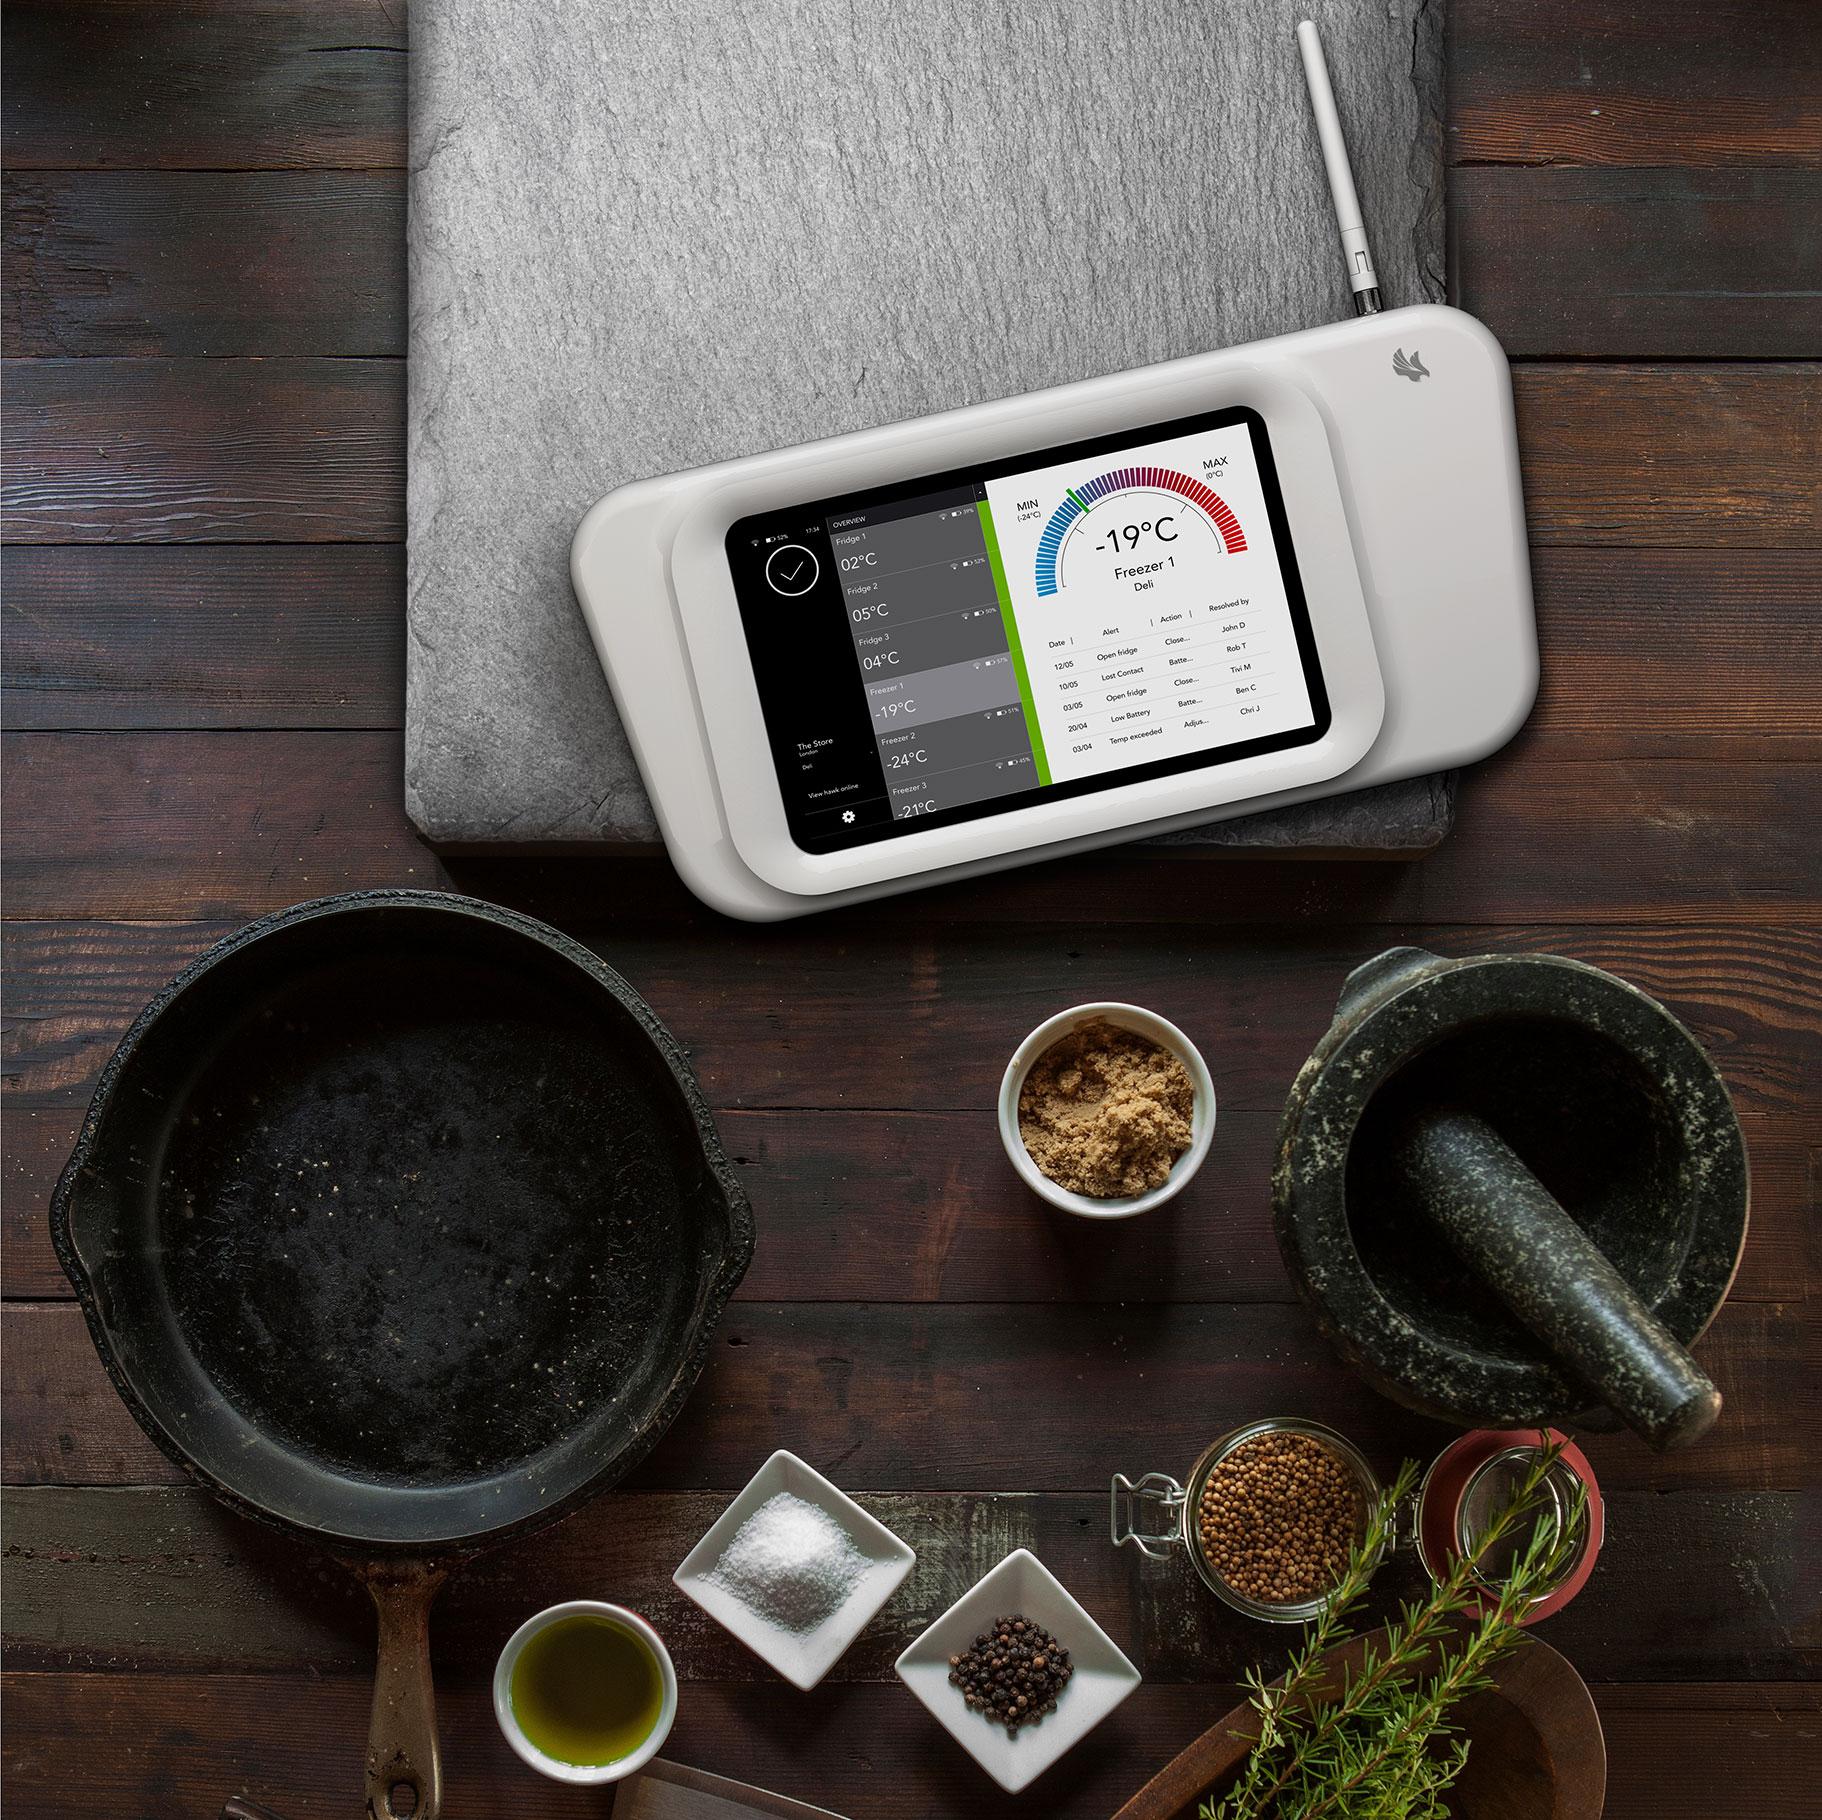 Hawk wireless monitoring solution